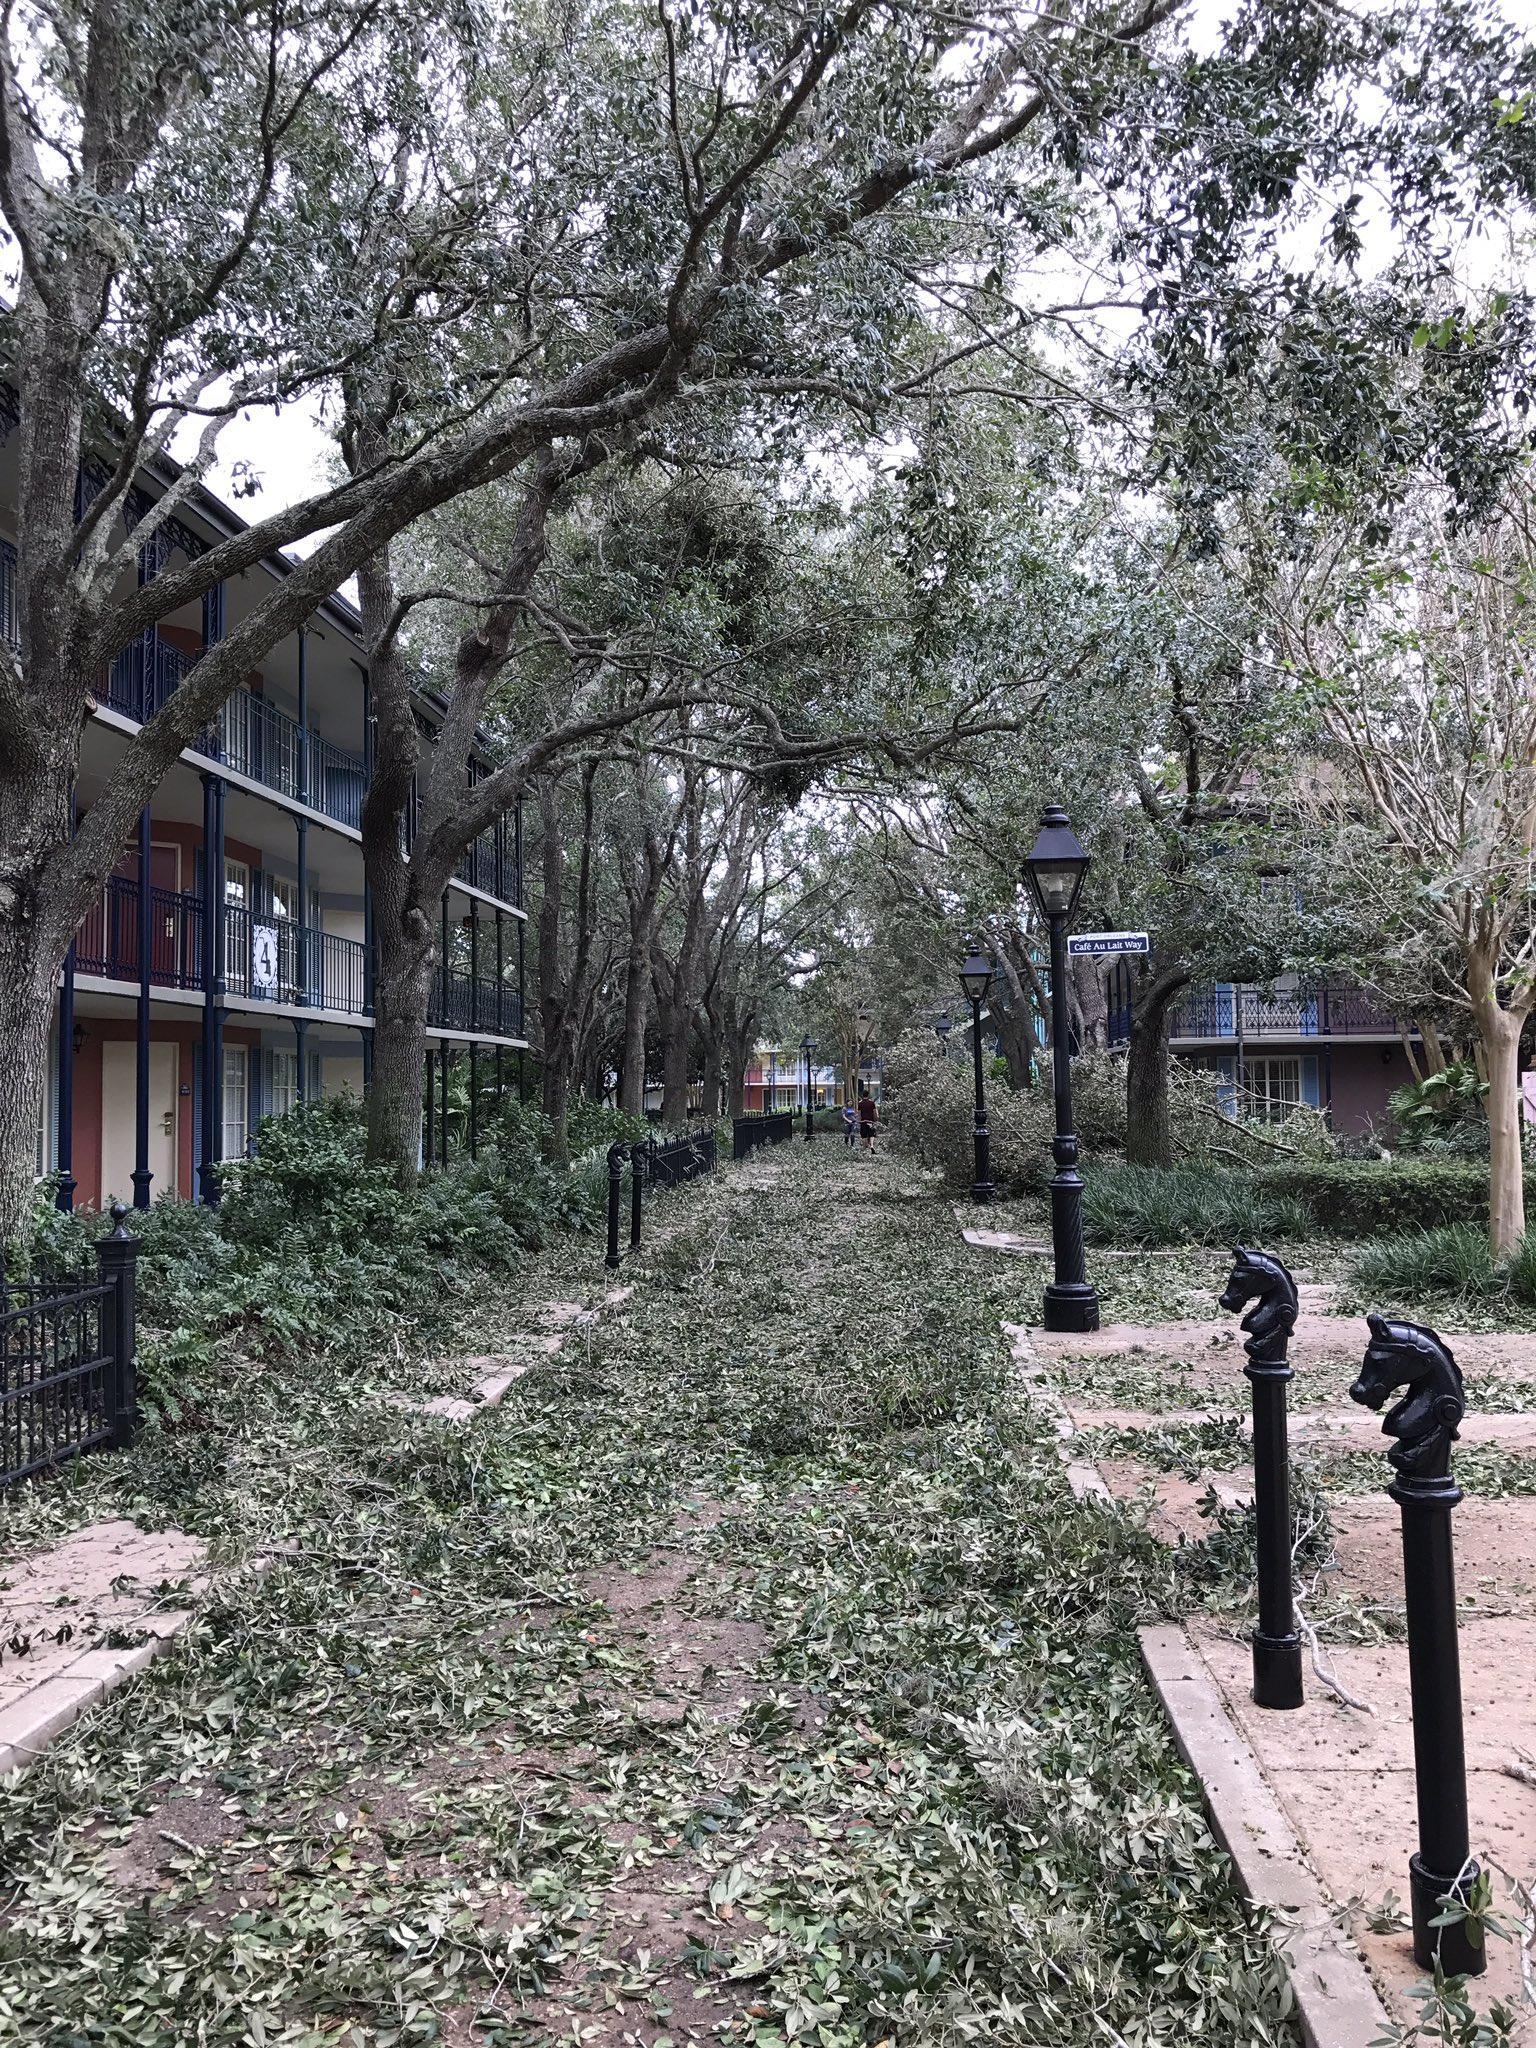 Hurricane Irma damage at Disney's Port Orleans Resort. Photo by @CafeFantasia